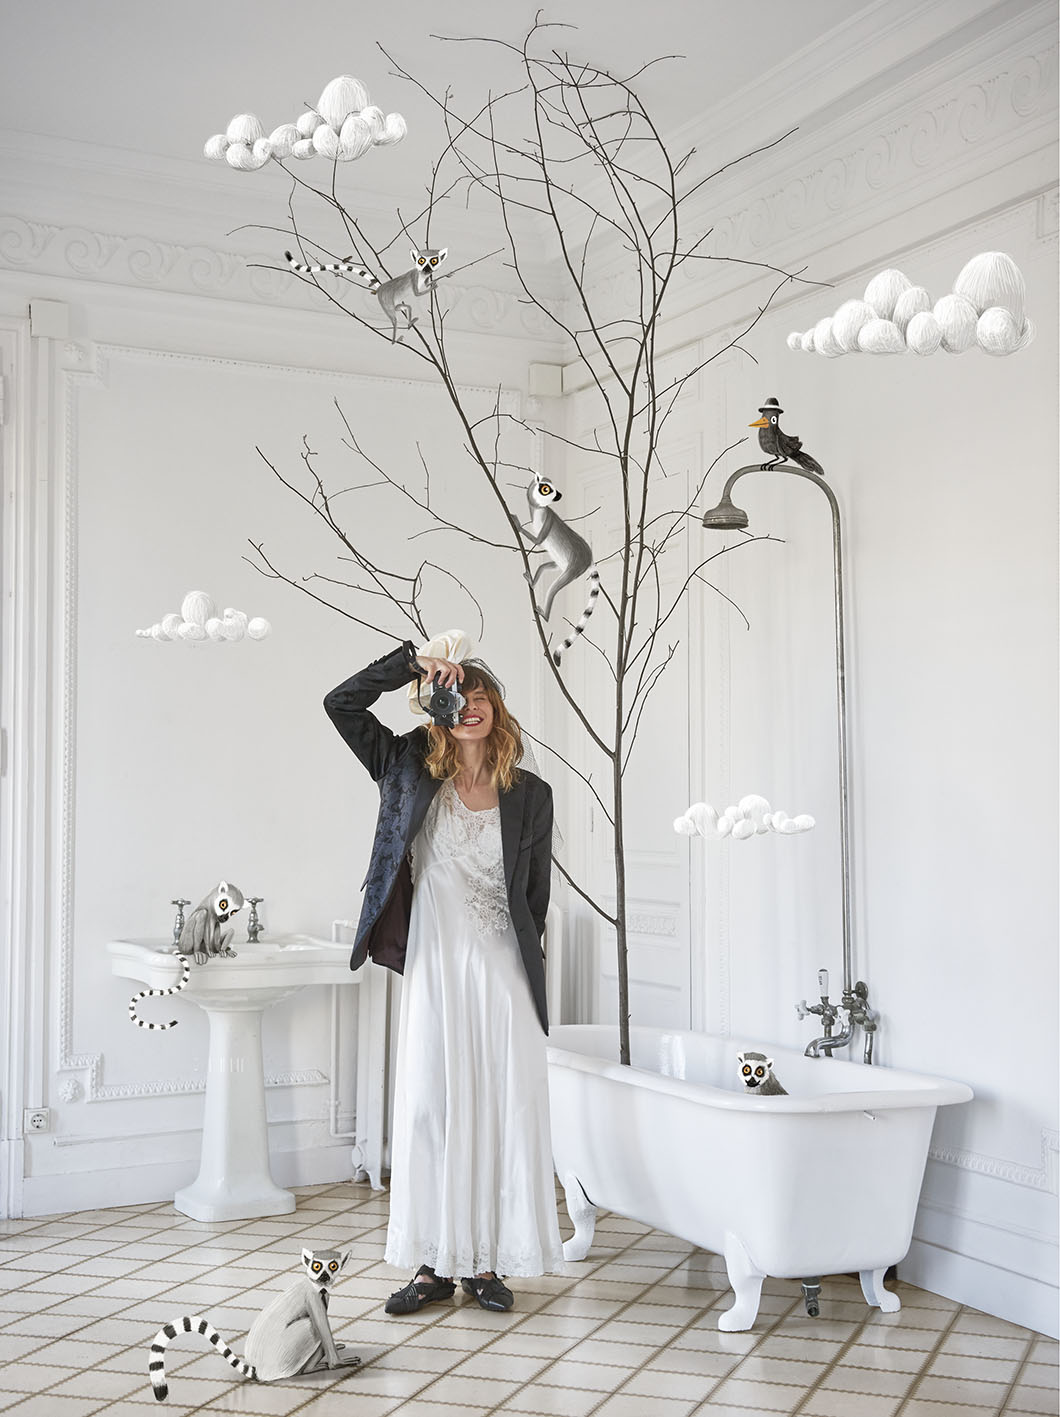 EvaBozzo-Selfportrait-Glamour.jpg